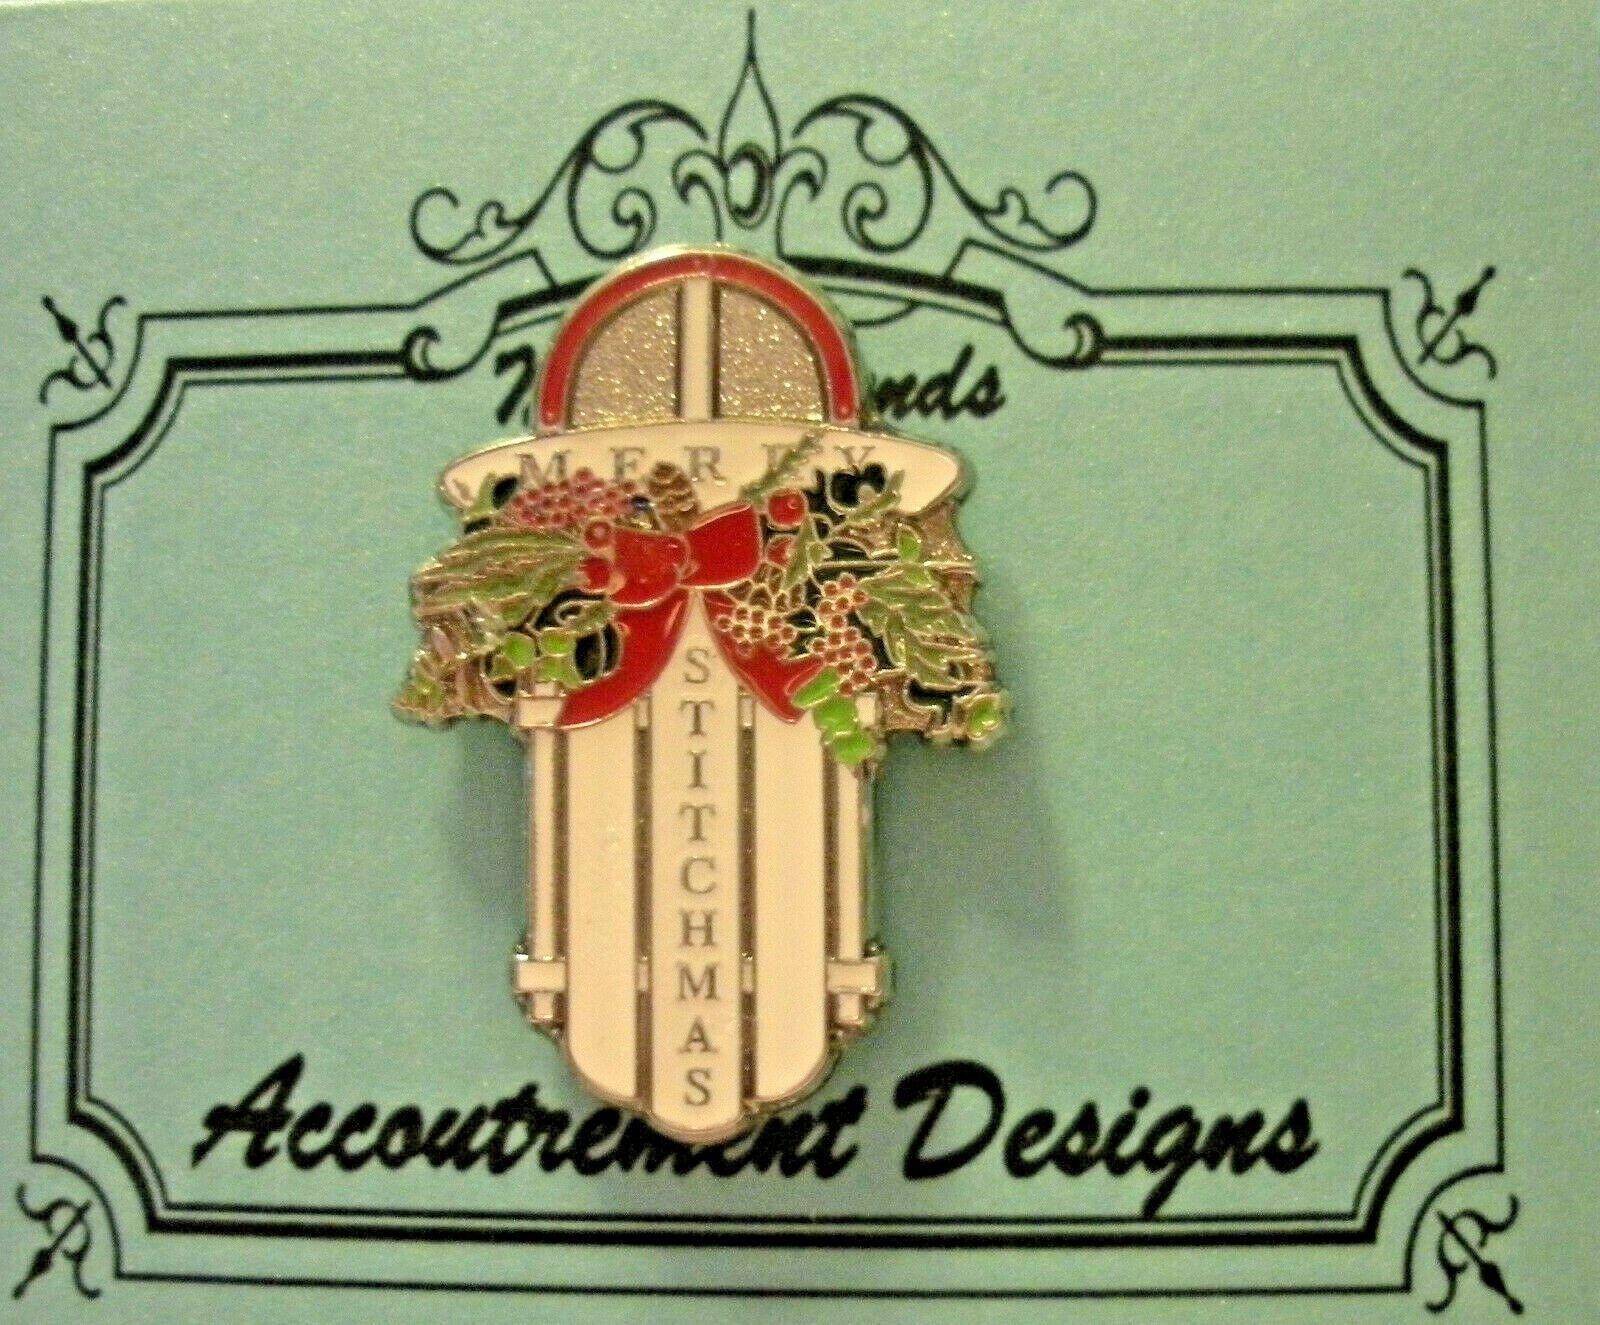 Accoutrement Designs Stitchmas Sleigh